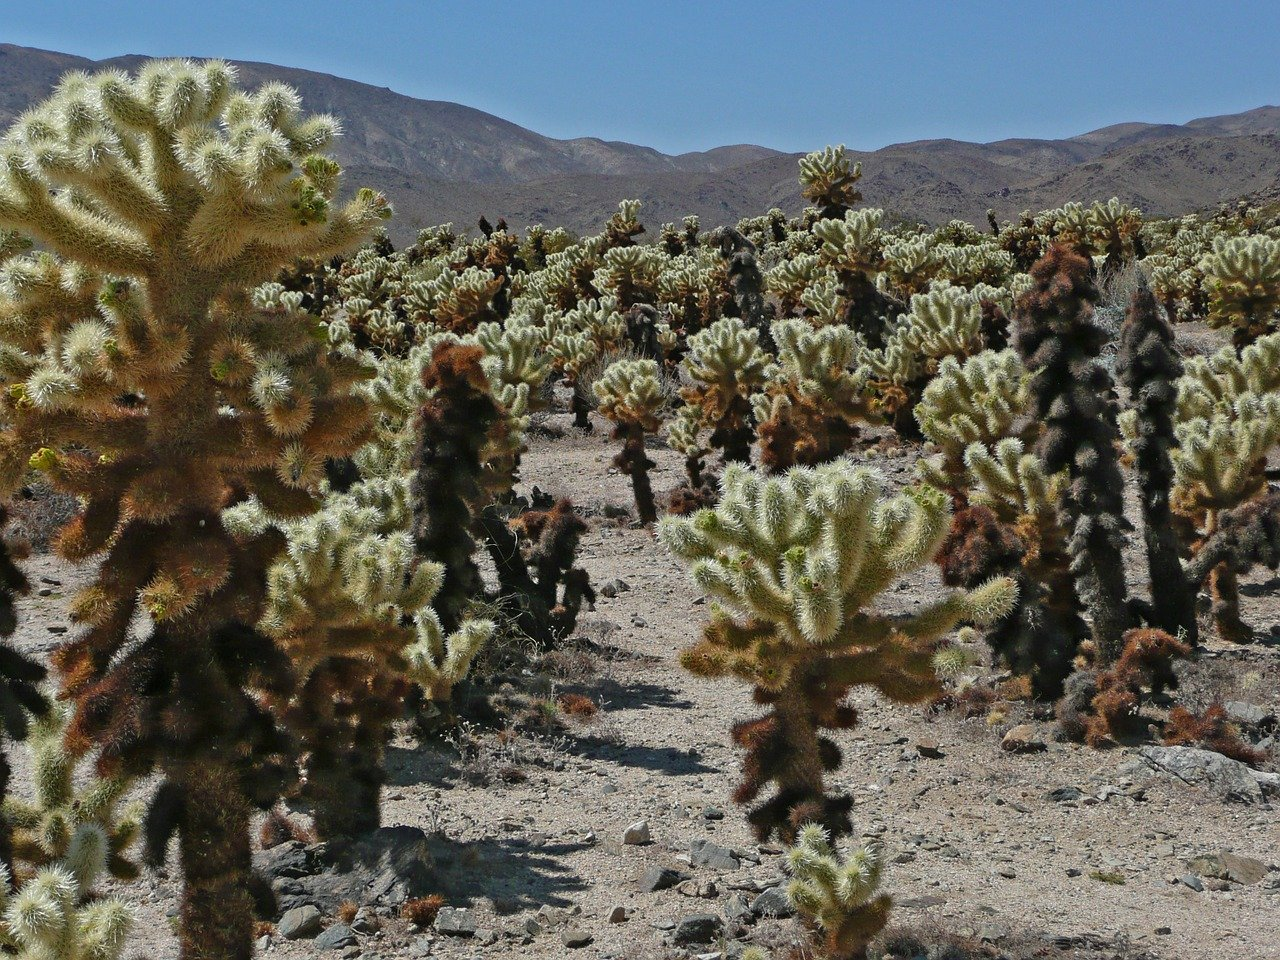 Popular Destination in California-Joshua Tree National Park